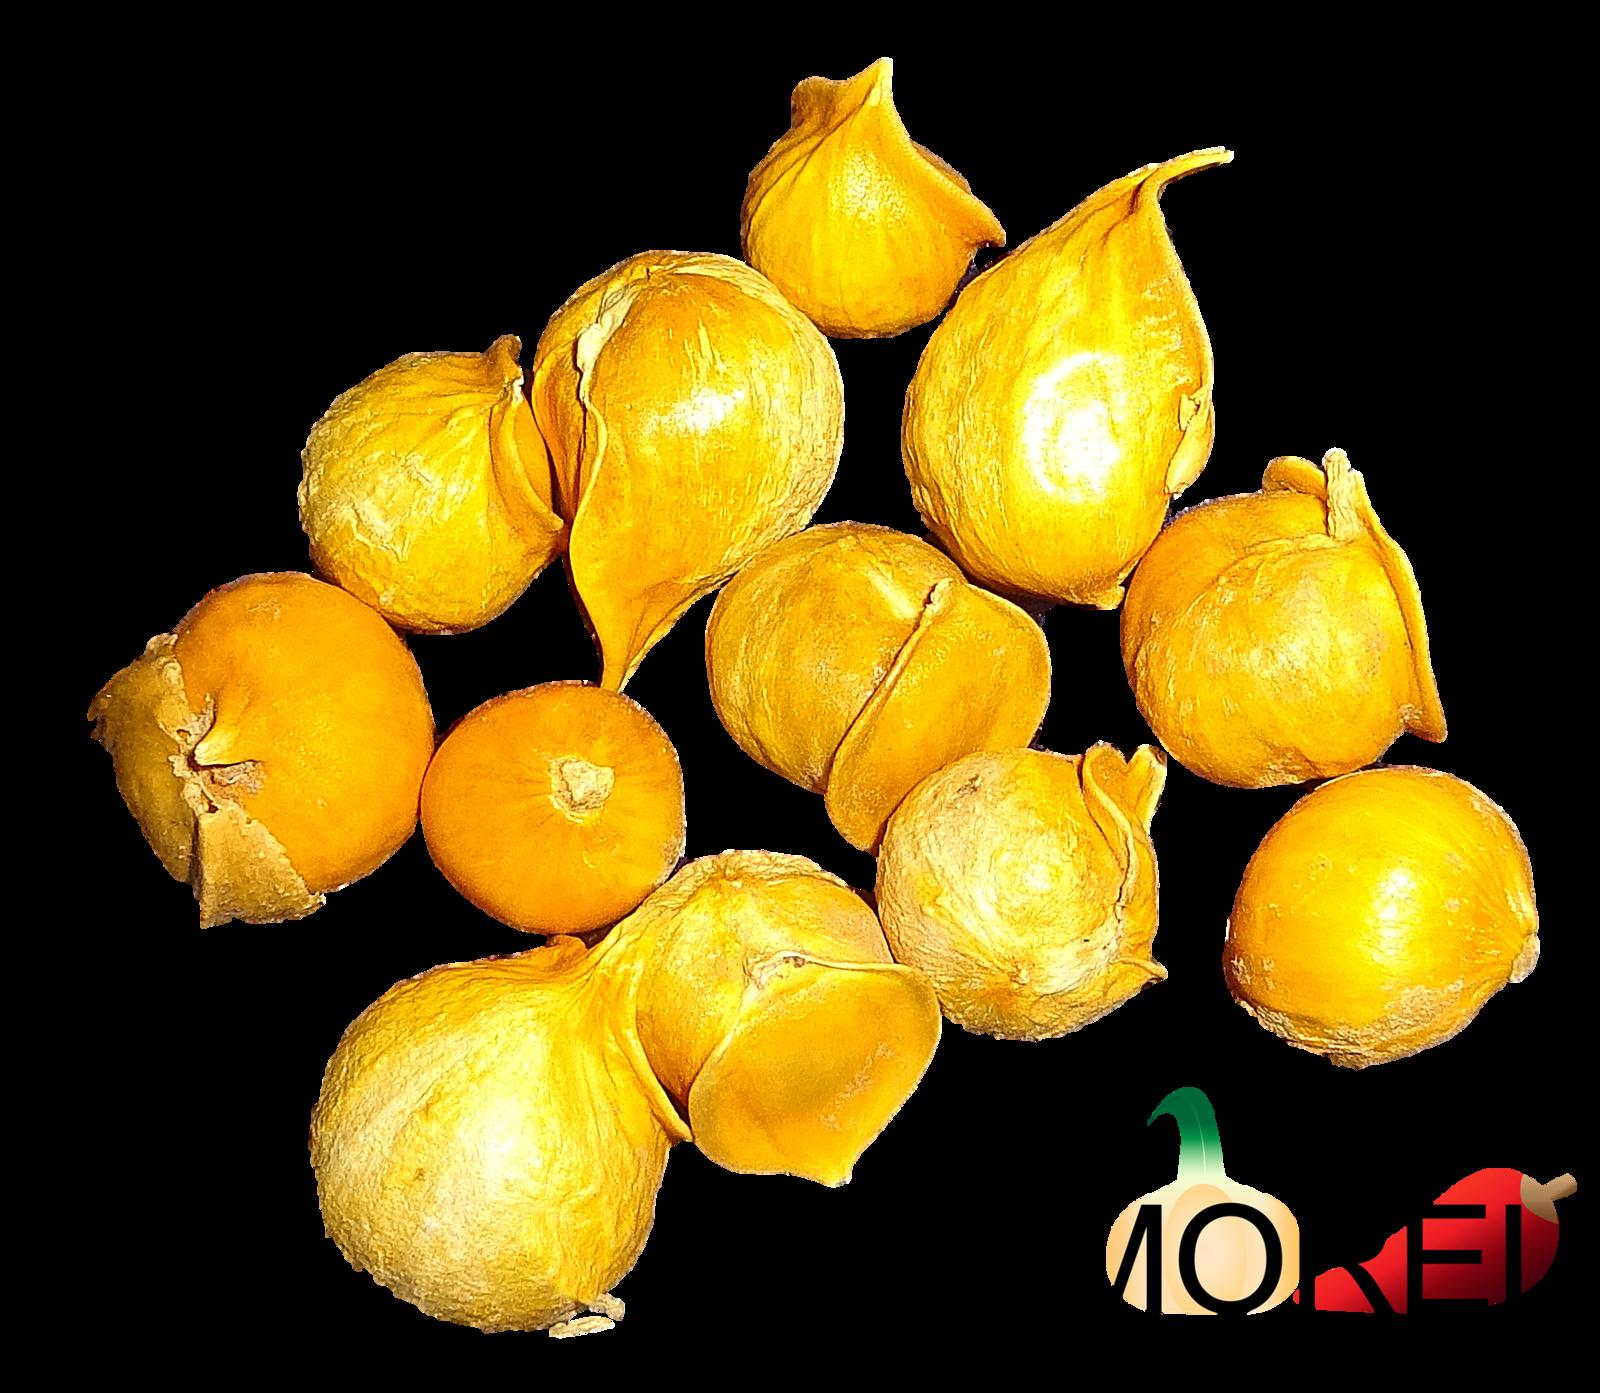 Japanese Garlic (Ajo Japones) Count per bag= 30-60-130